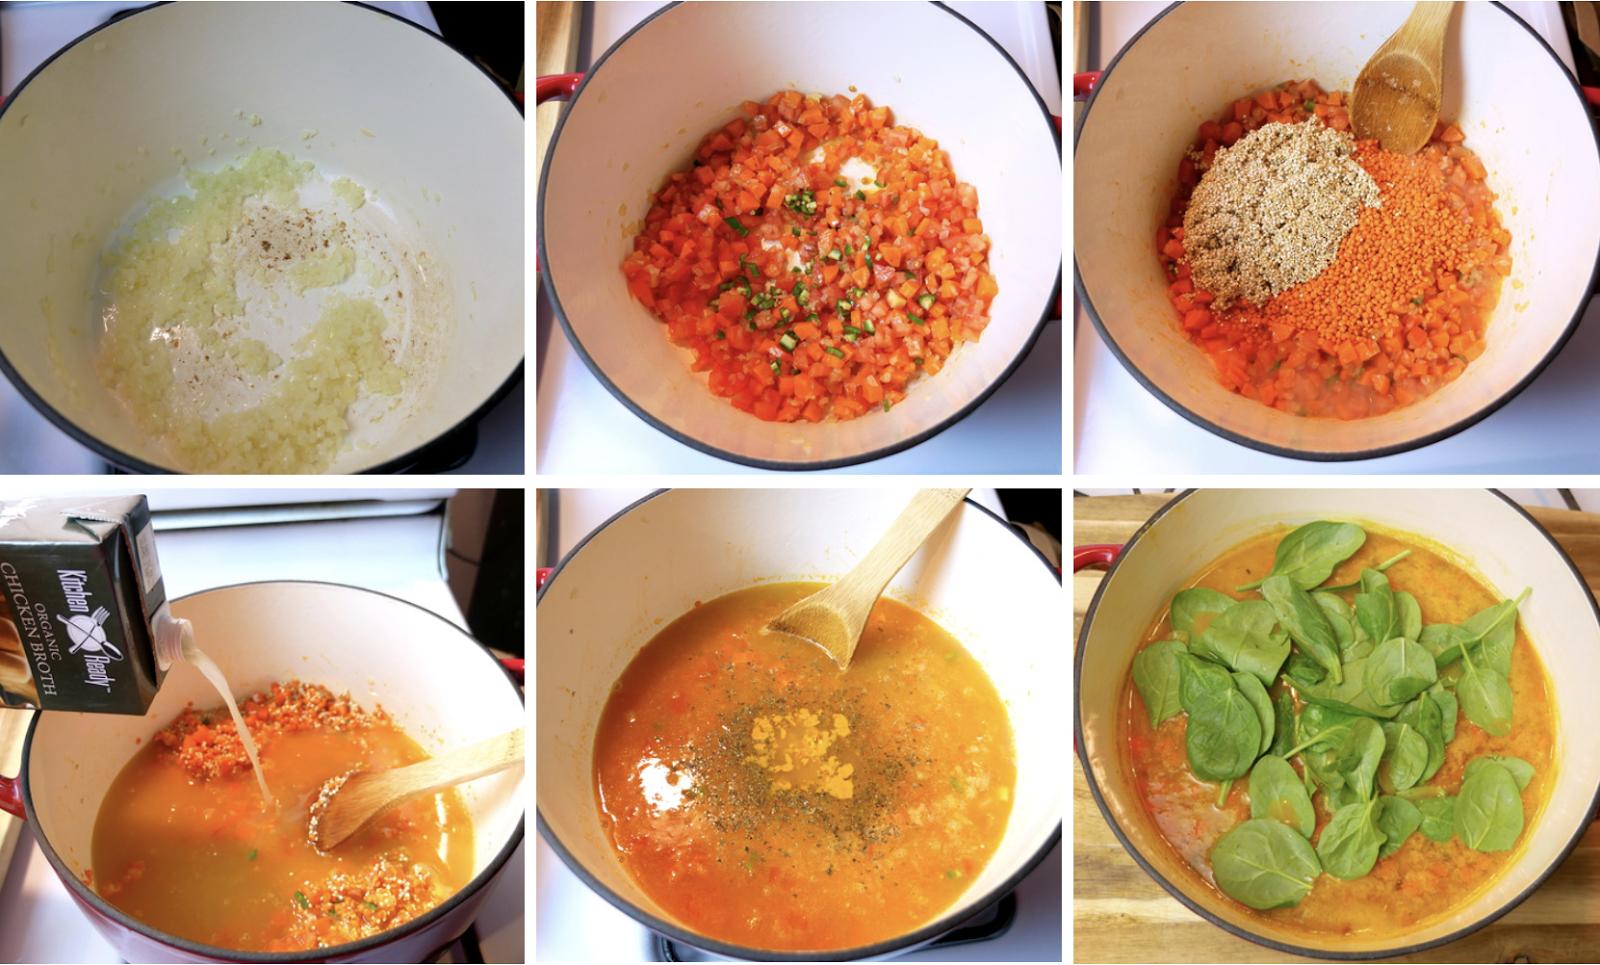 Mi Cocina Rápida: Red Lentil and Quinoa Soup.